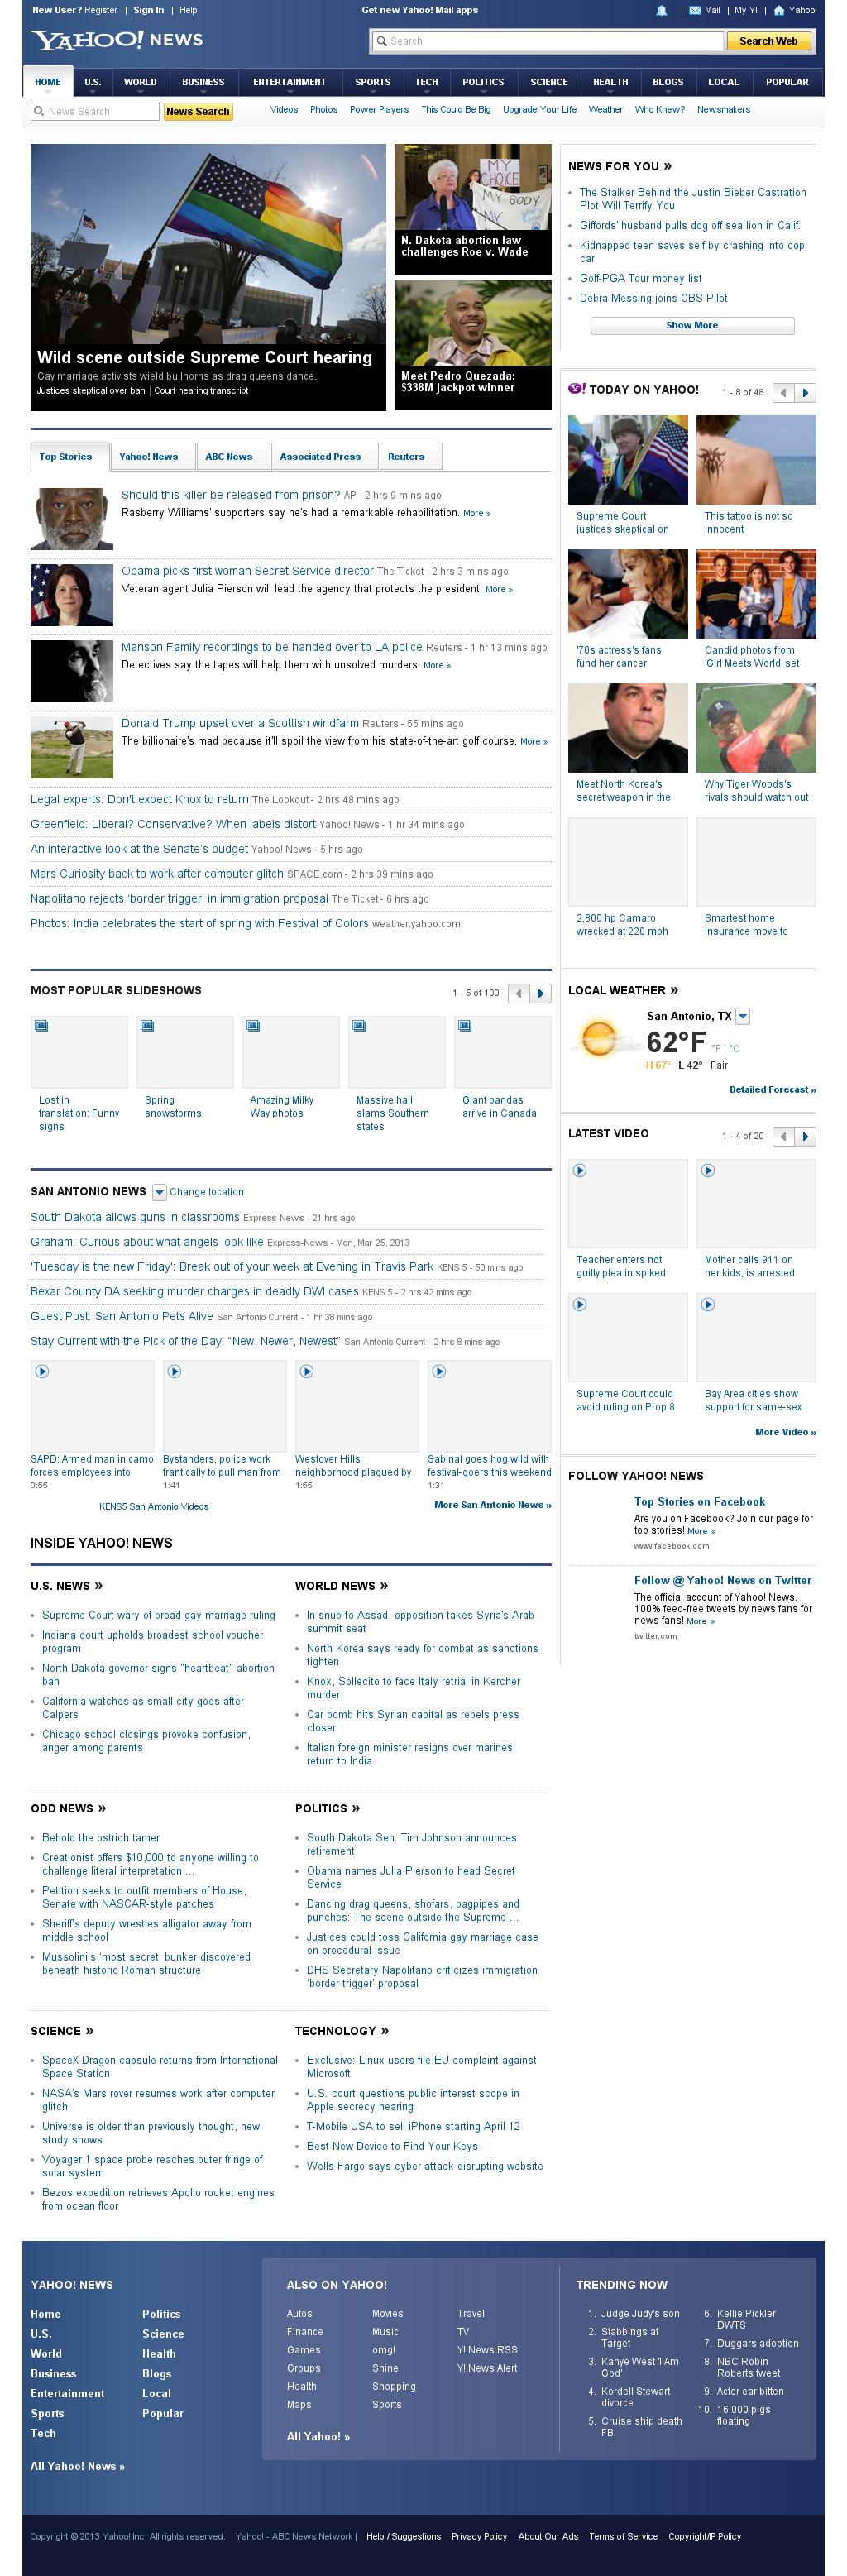 Yahoo! News at Tuesday March 26, 2013, 8:51 p.m. UTC